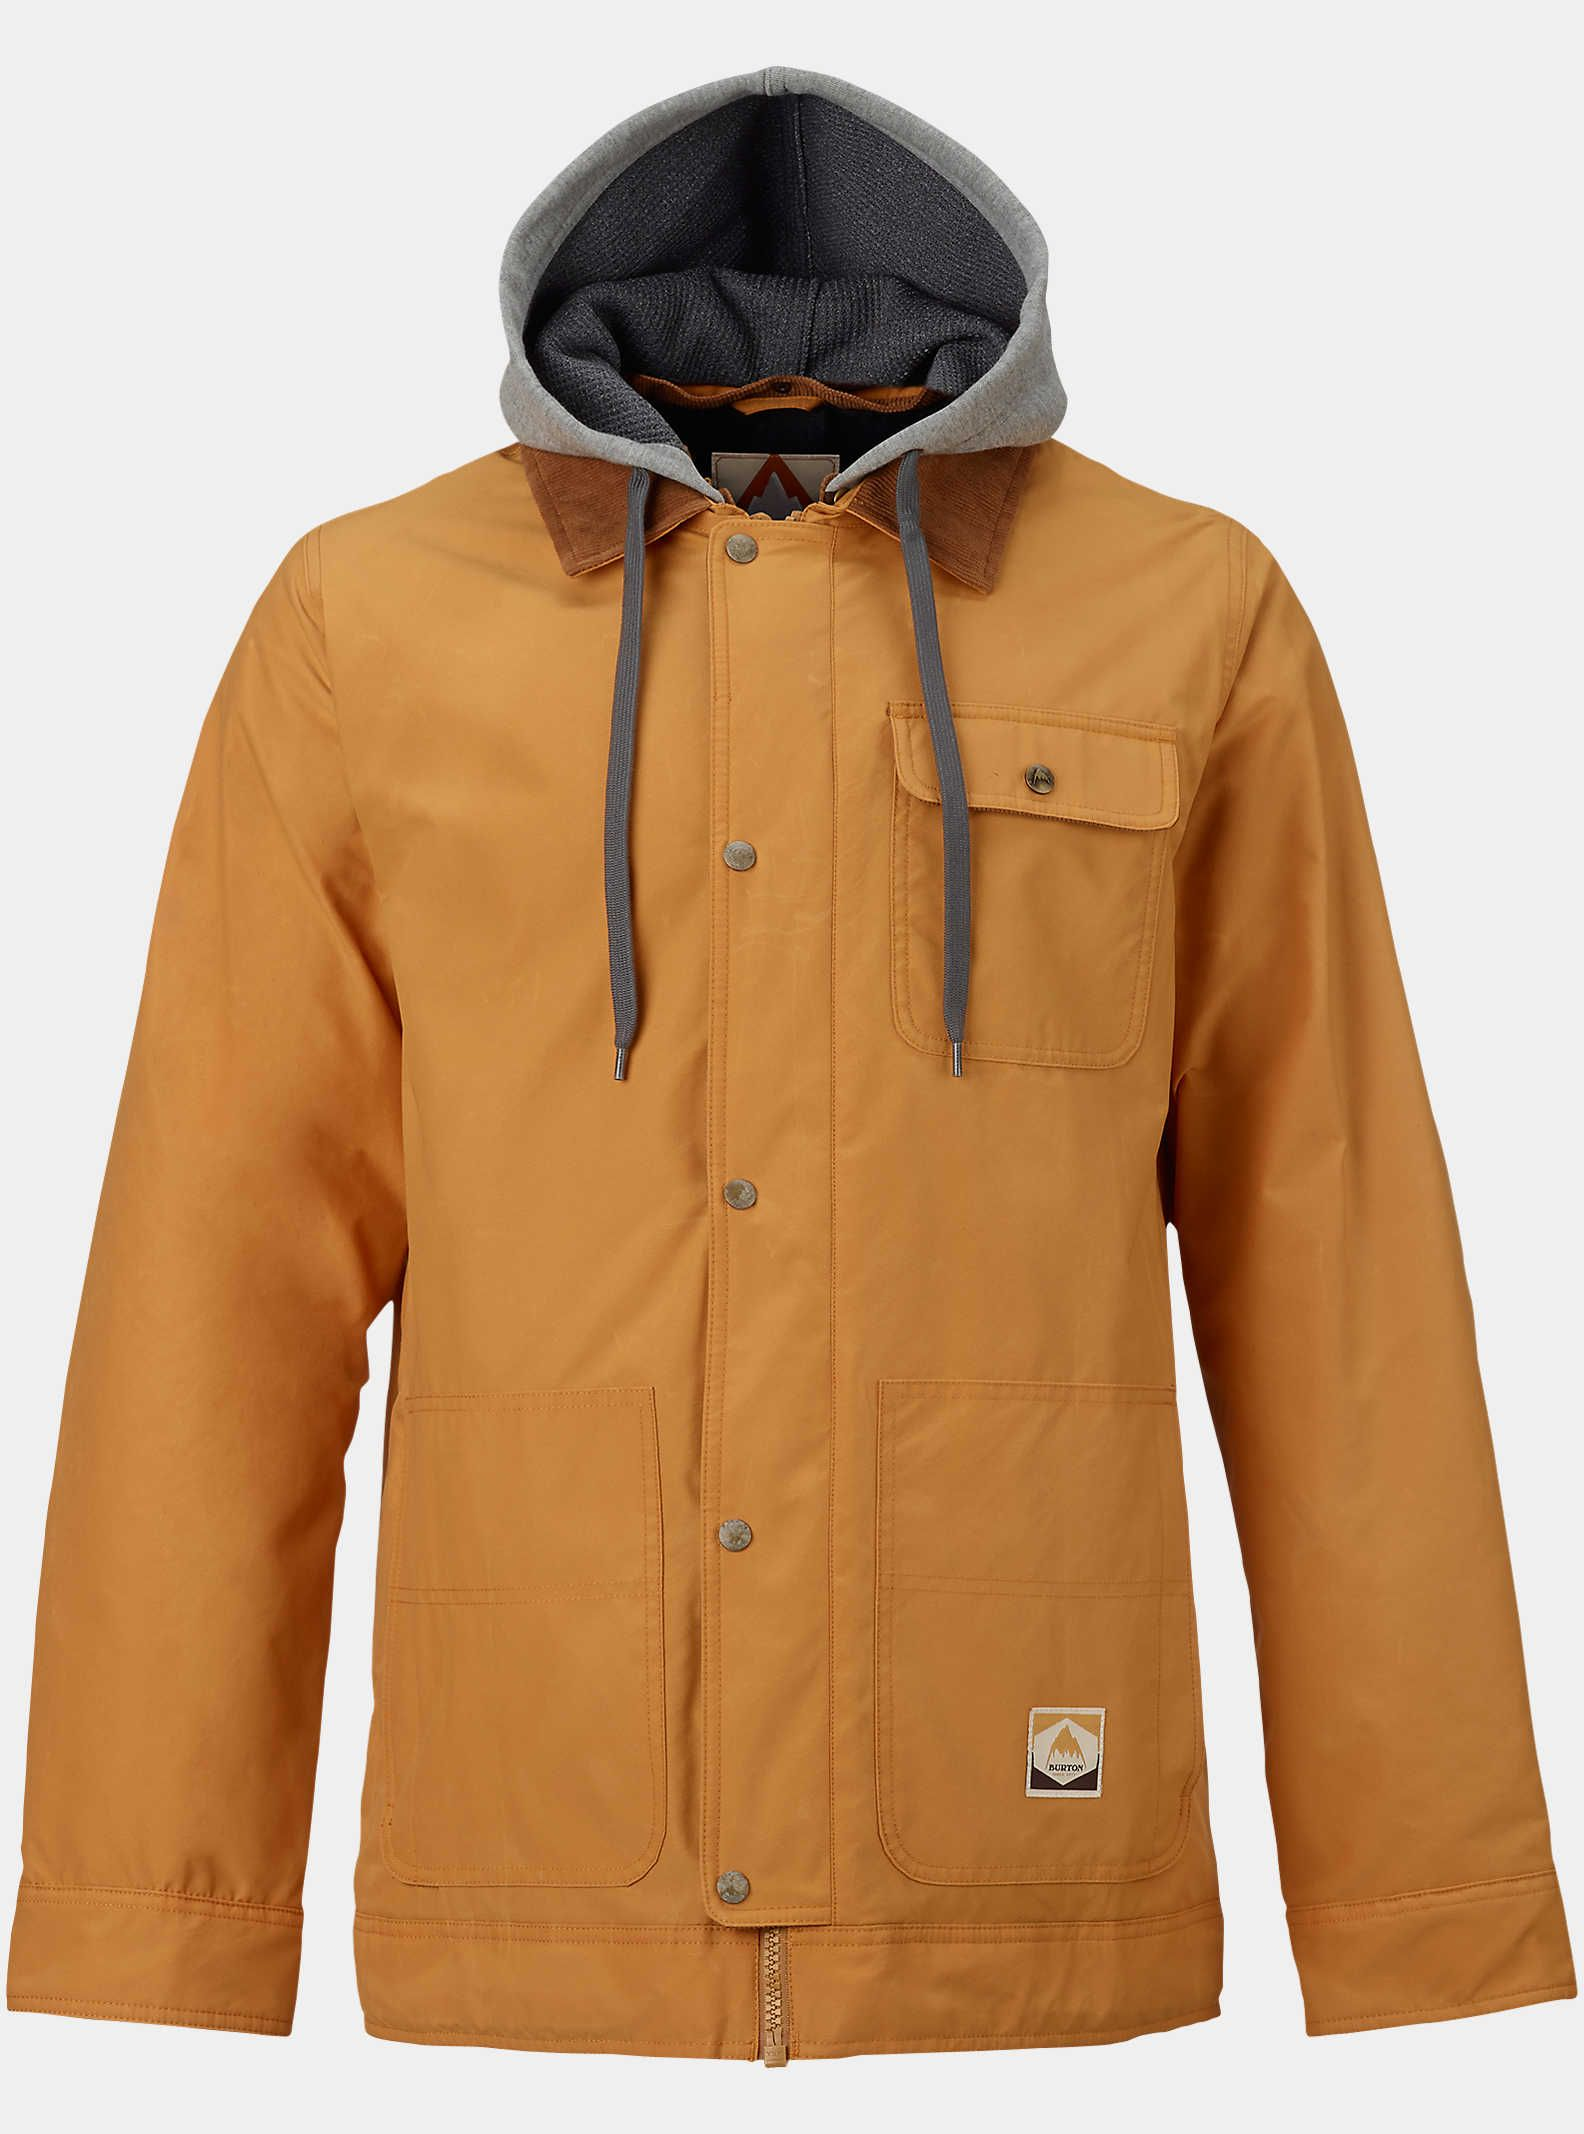 ad0096dcf276 Burton Dunmore Jacket